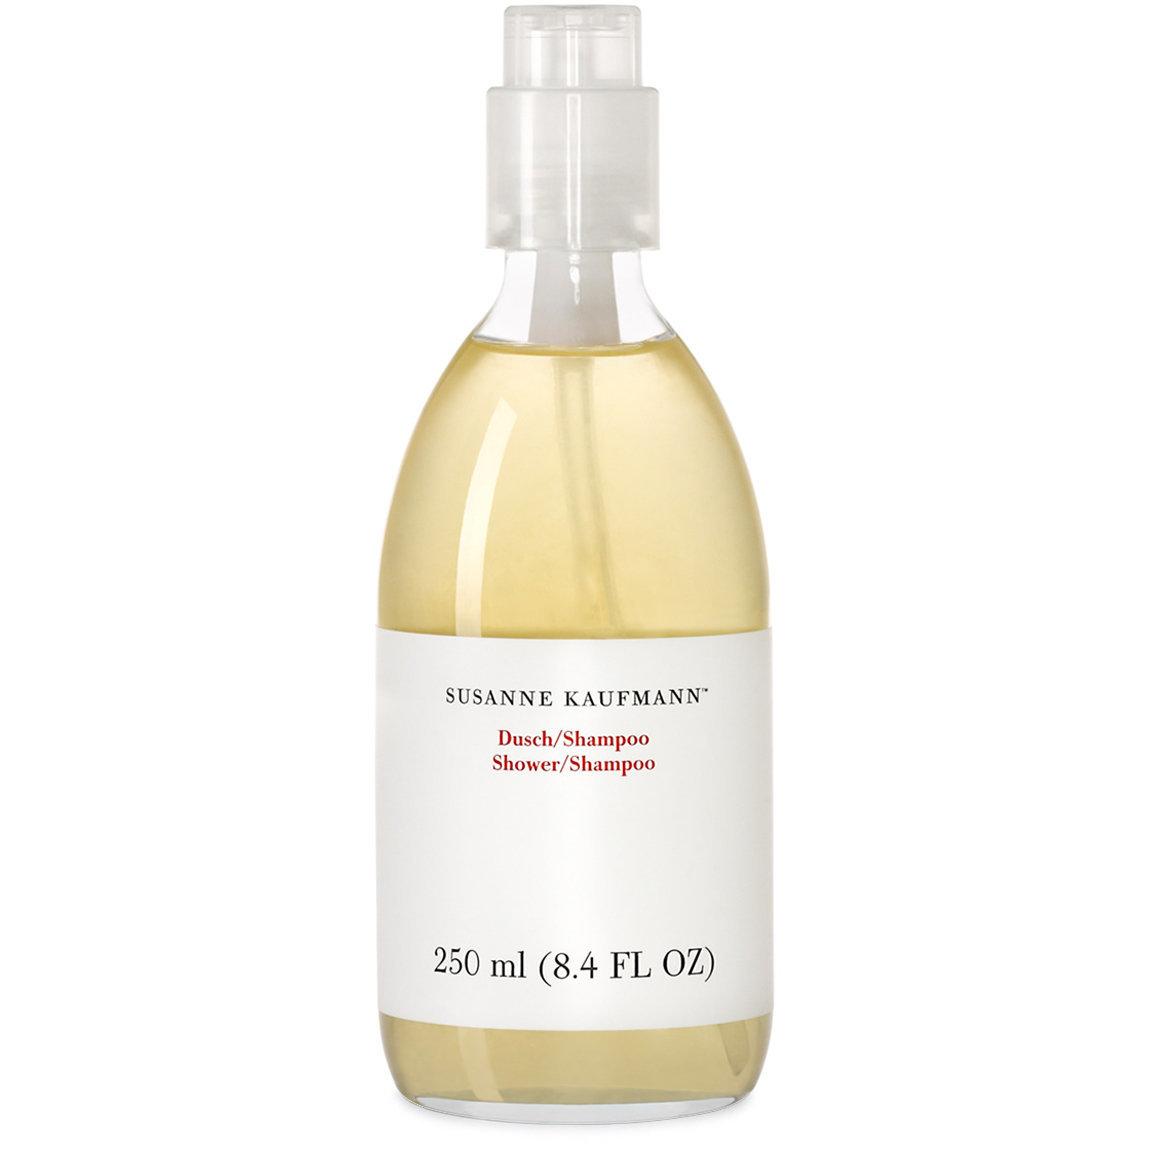 Susanne Kaufmann Shower/Shampoo alternative view 1 - product swatch.